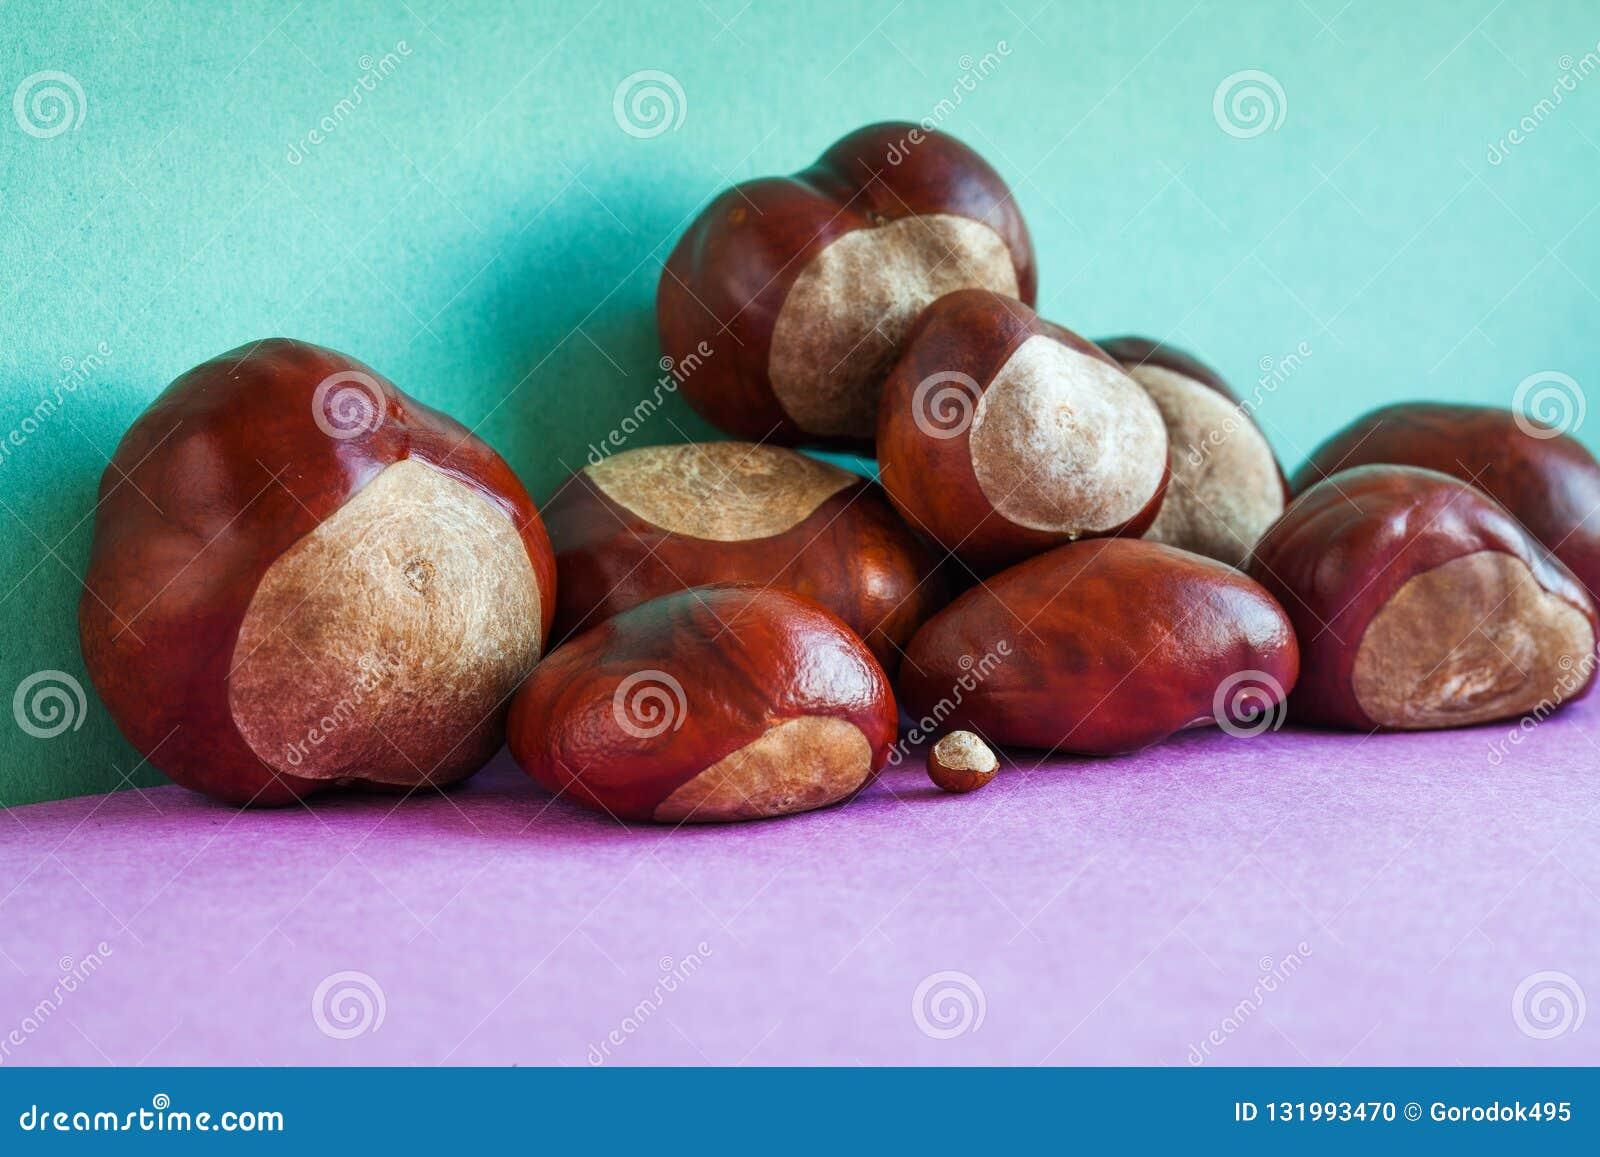 Horse chestnut seeds on purple green background. Autumn artistic still life with Aesculus hippocastanumon ripe Buckeye